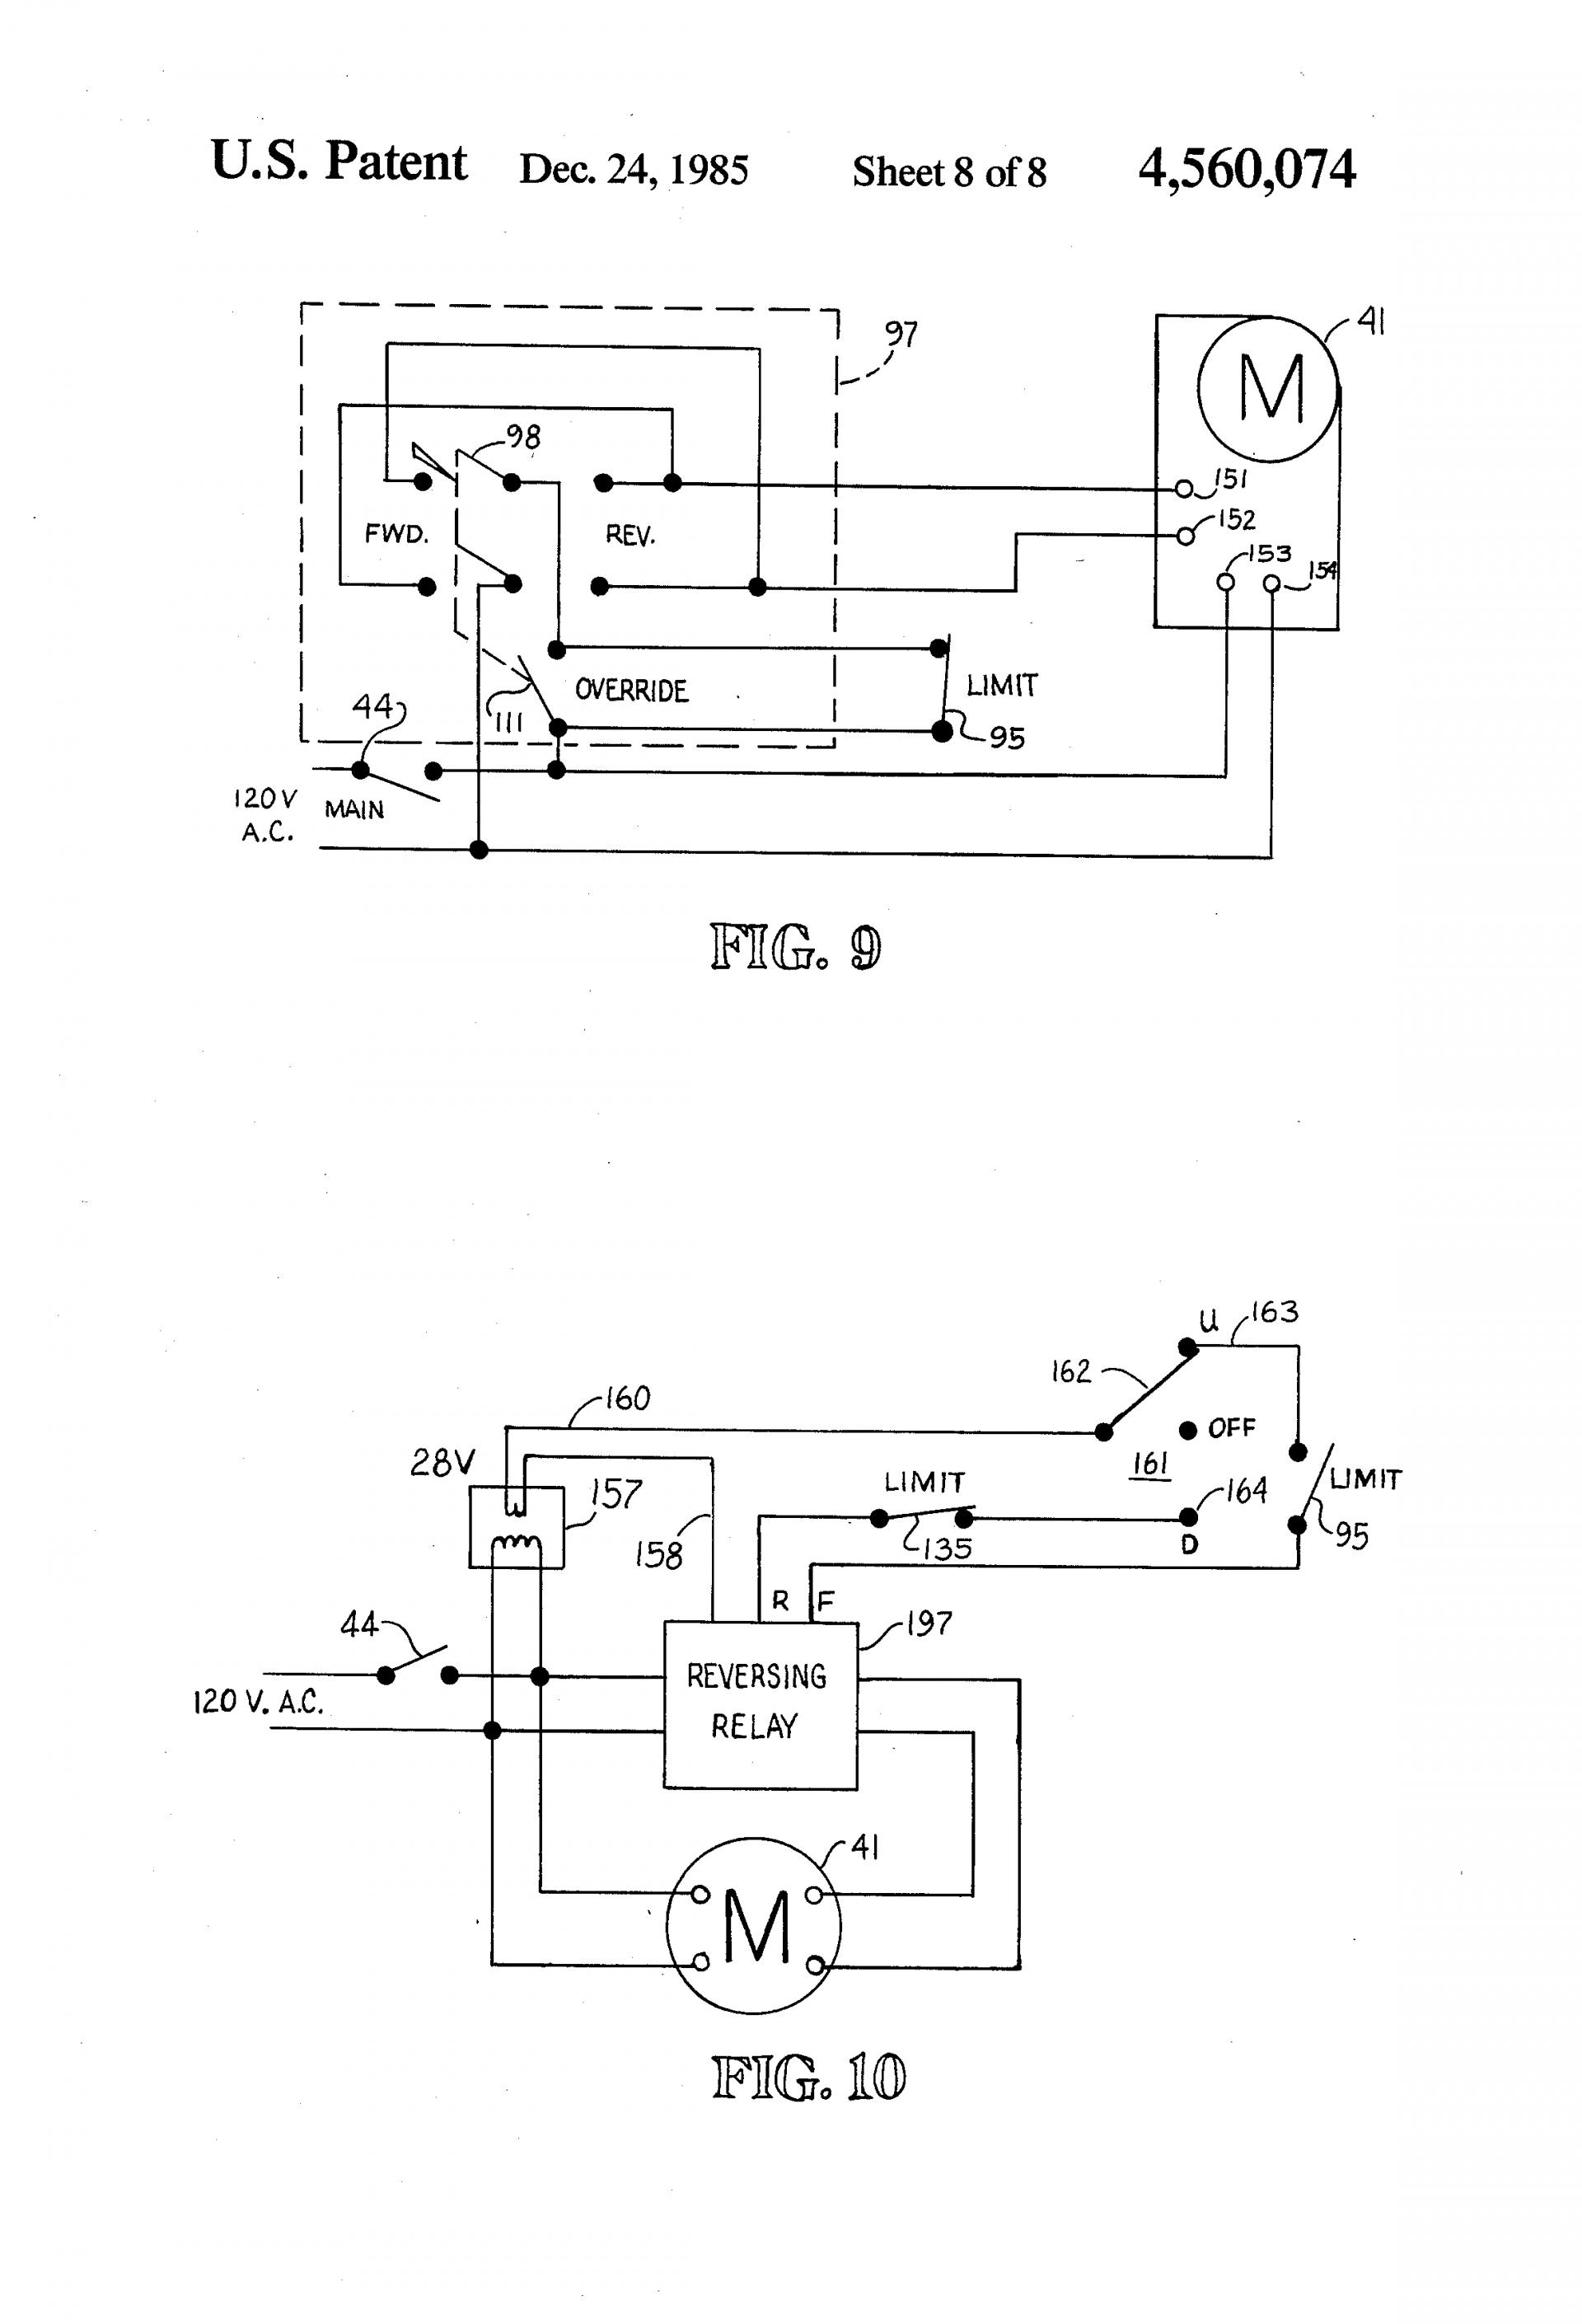 Spx Stone Hydraulic Pump Wiring Diagram Manual Guide